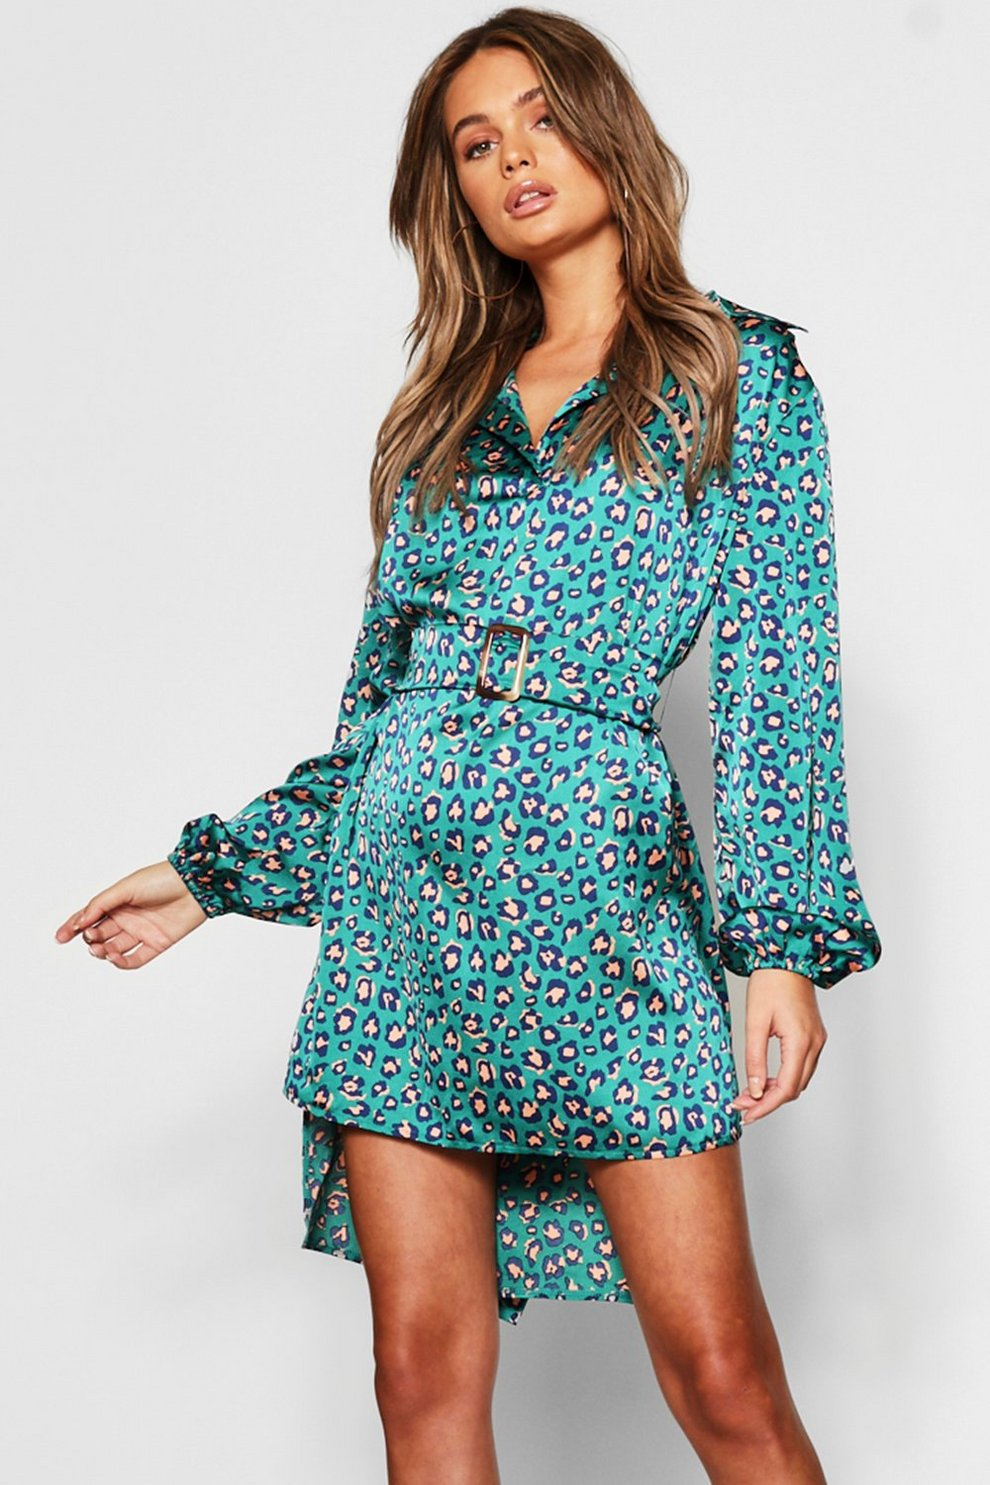 83abfa99b476 Womens Teal Leopard Print Tie Waist Shirt Dress